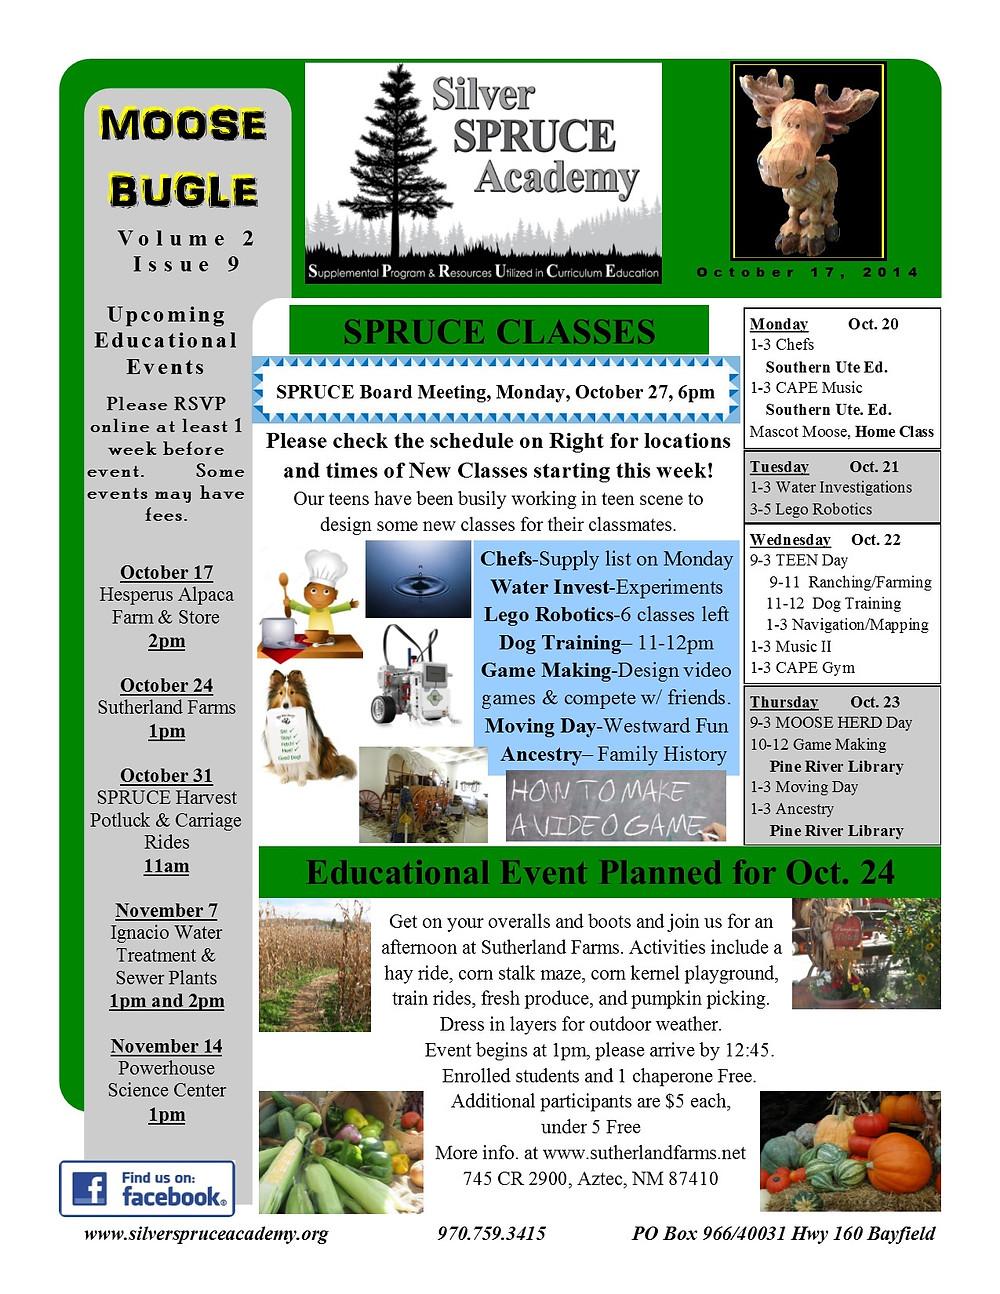 Moose Bugle 10-17-14 Page 1.jpg